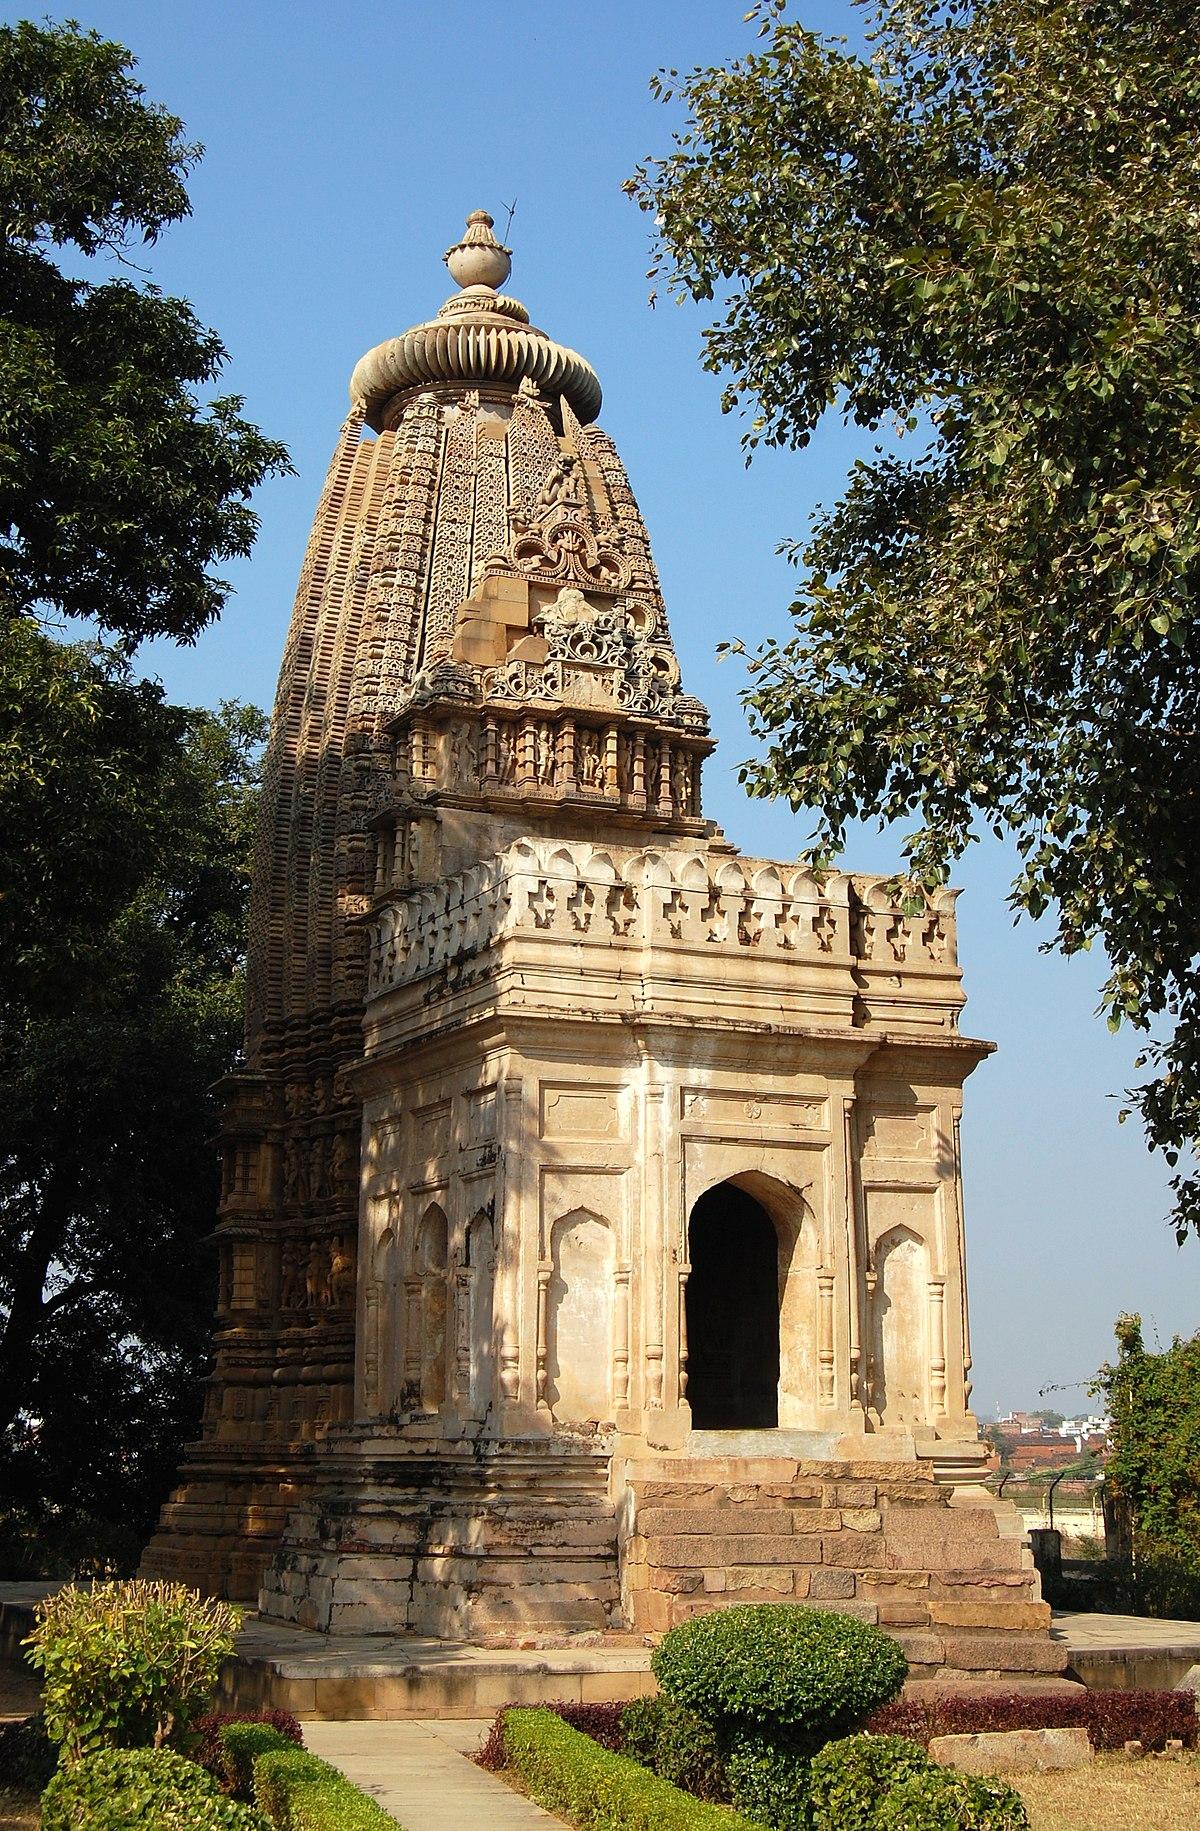 Adinatha temple, Khajuraho - Wikipedia